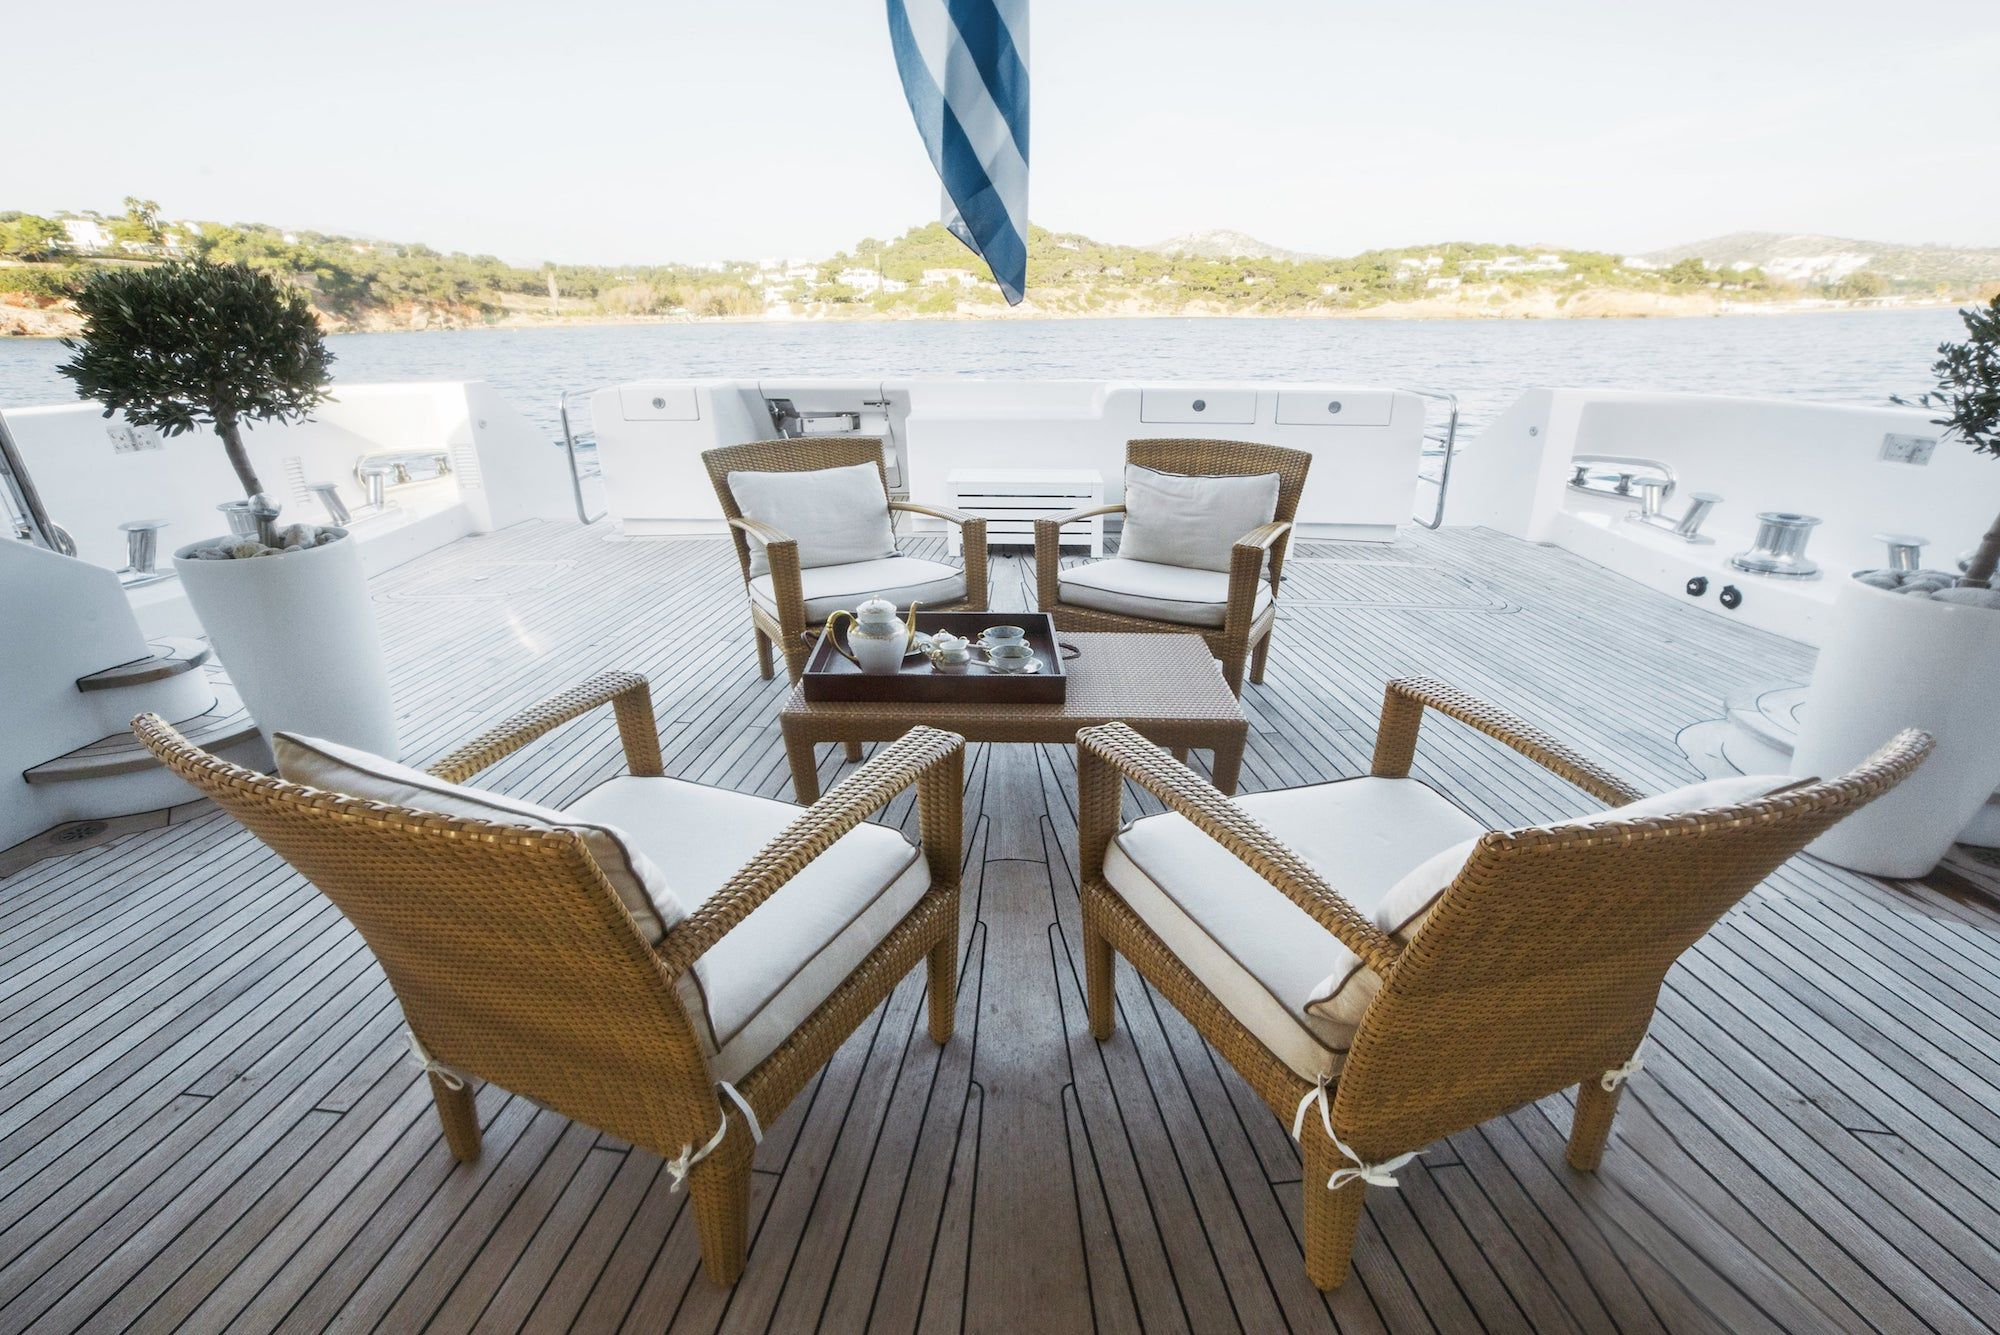 ISA Motor Yacht OASIS Aft Deck